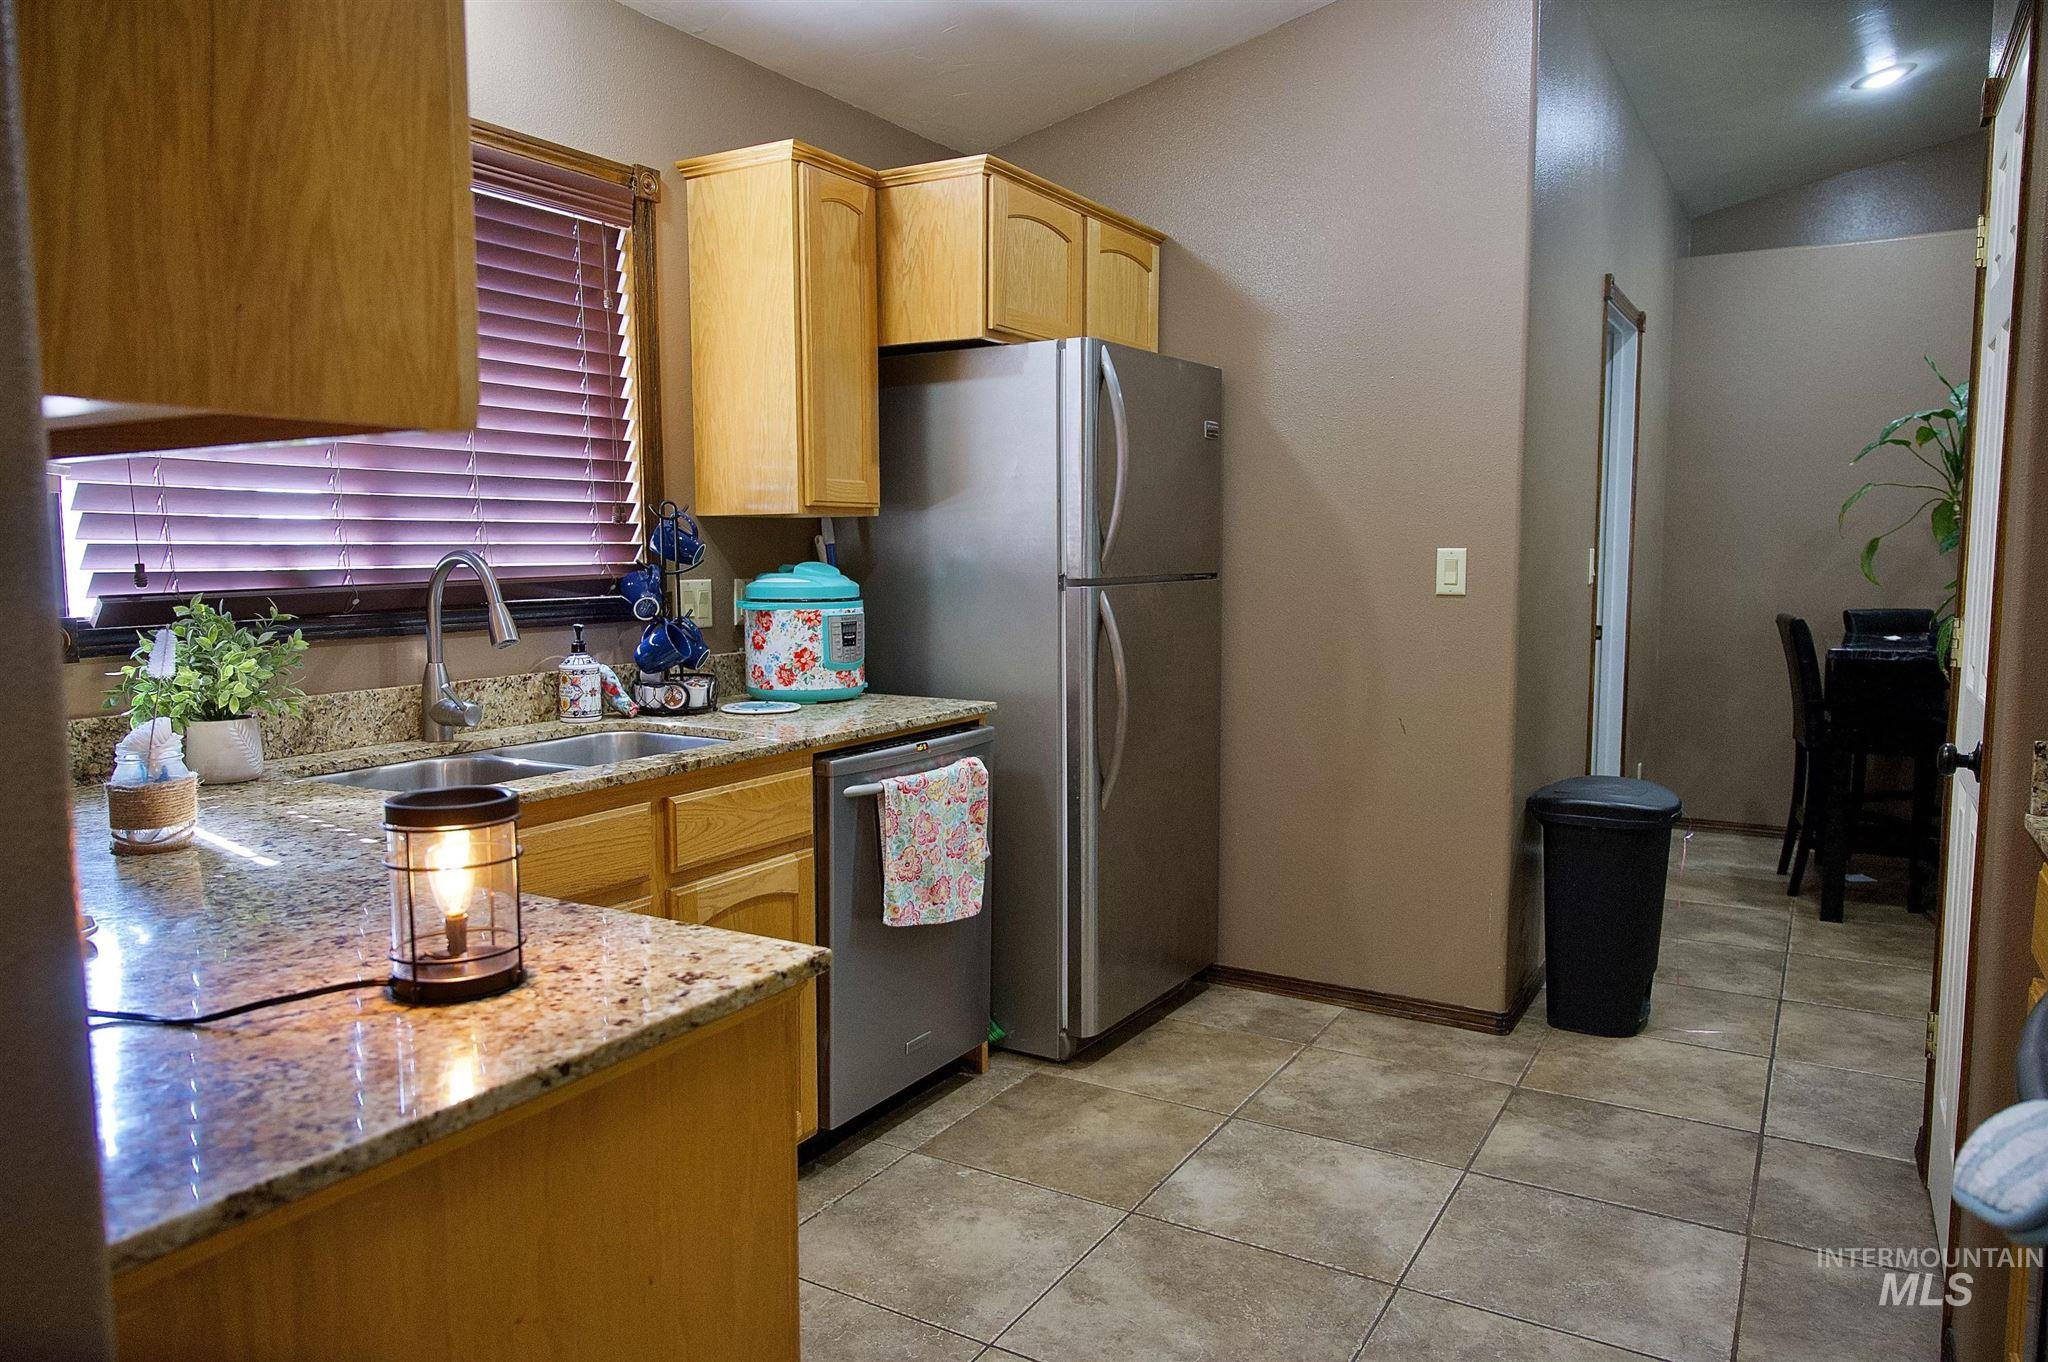 423 N 100 E Property Photo 18